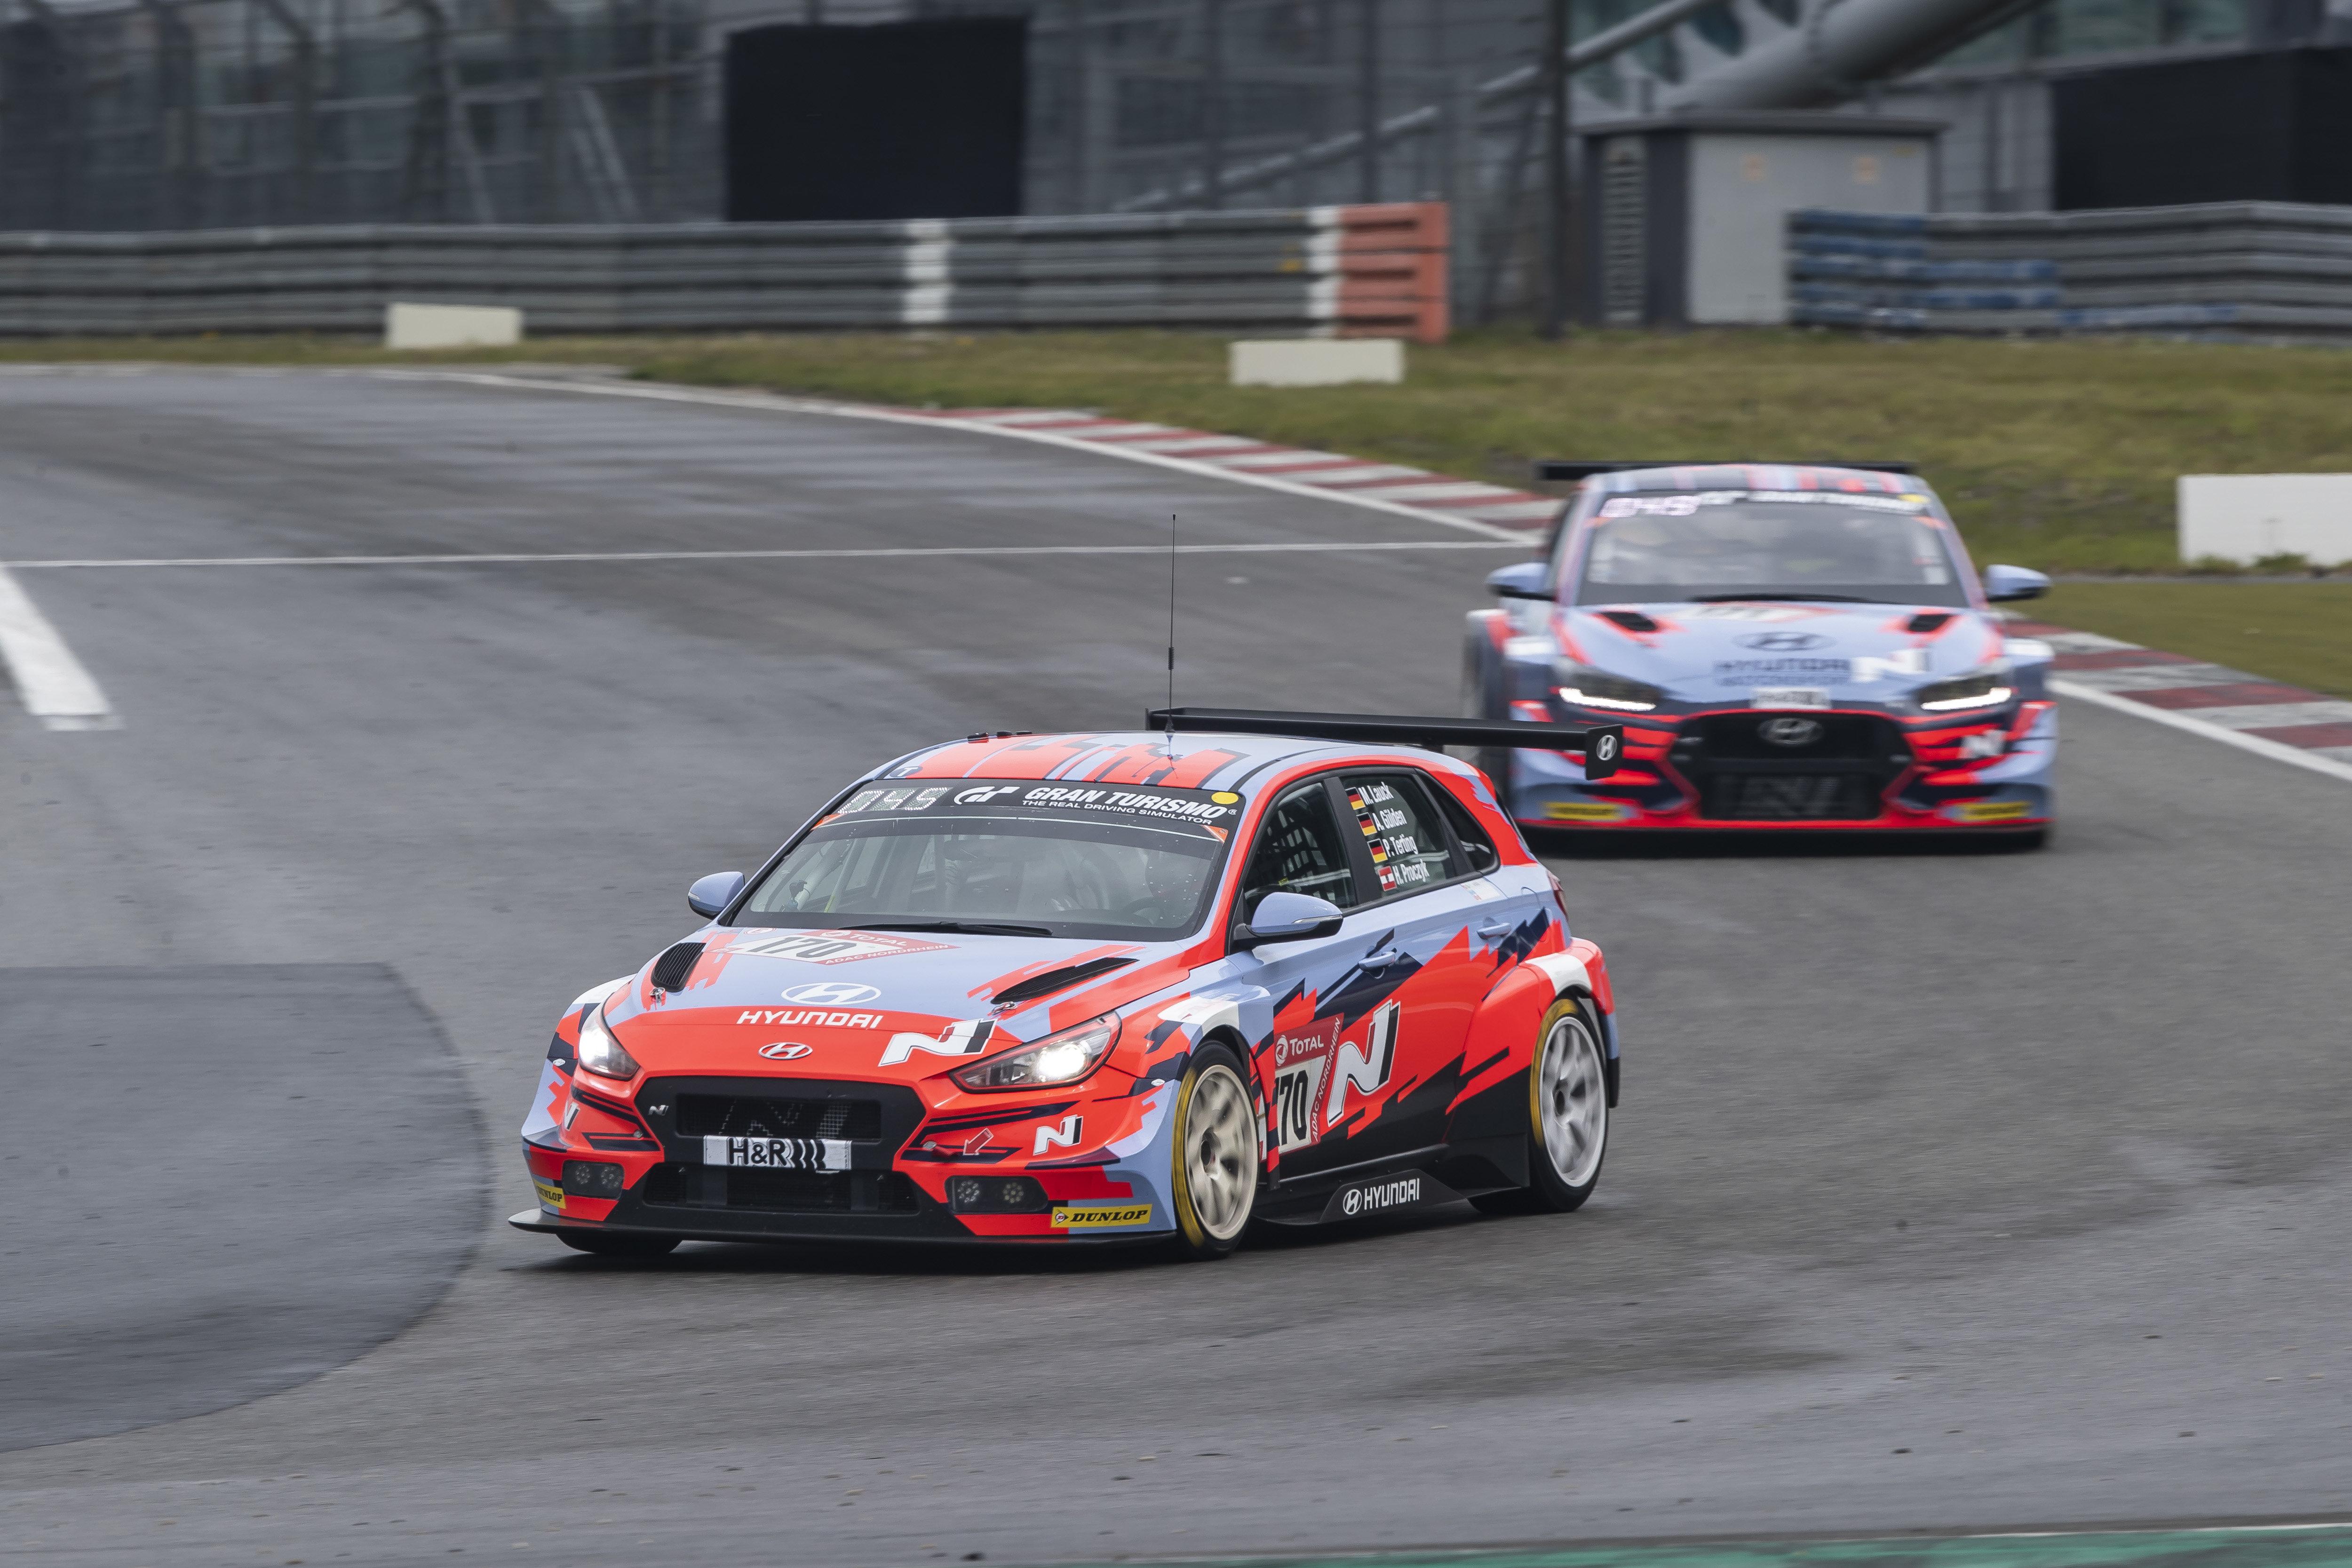 Hyundai Motorsport TCR teams - Nürburgring 24 Hours Qualifying Race